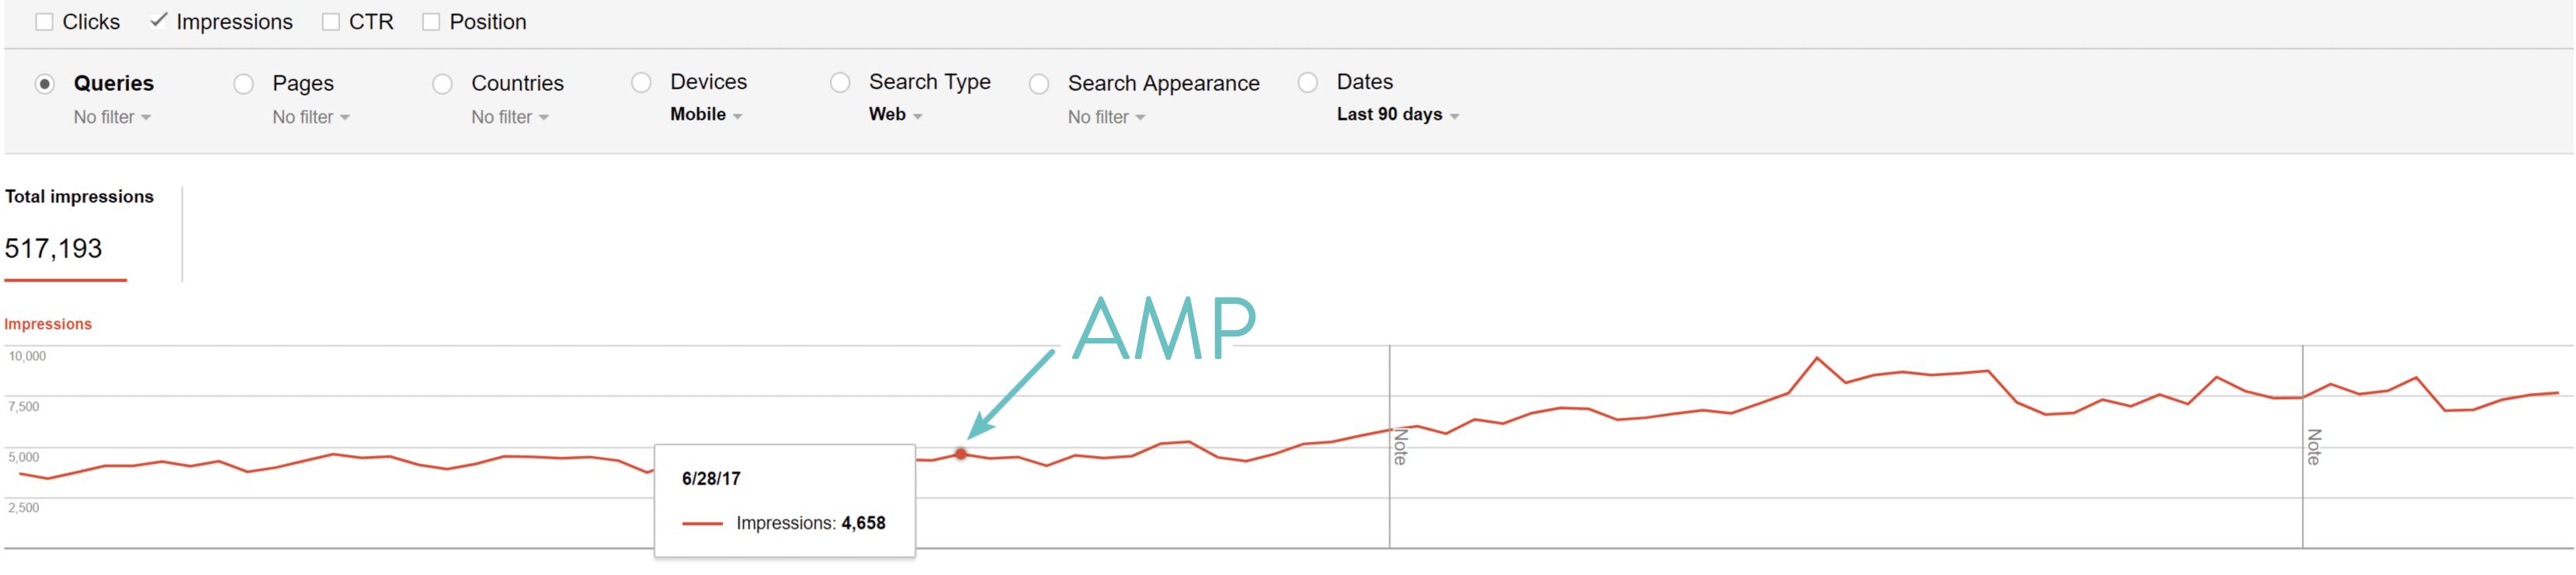 Google AMPの表示回数